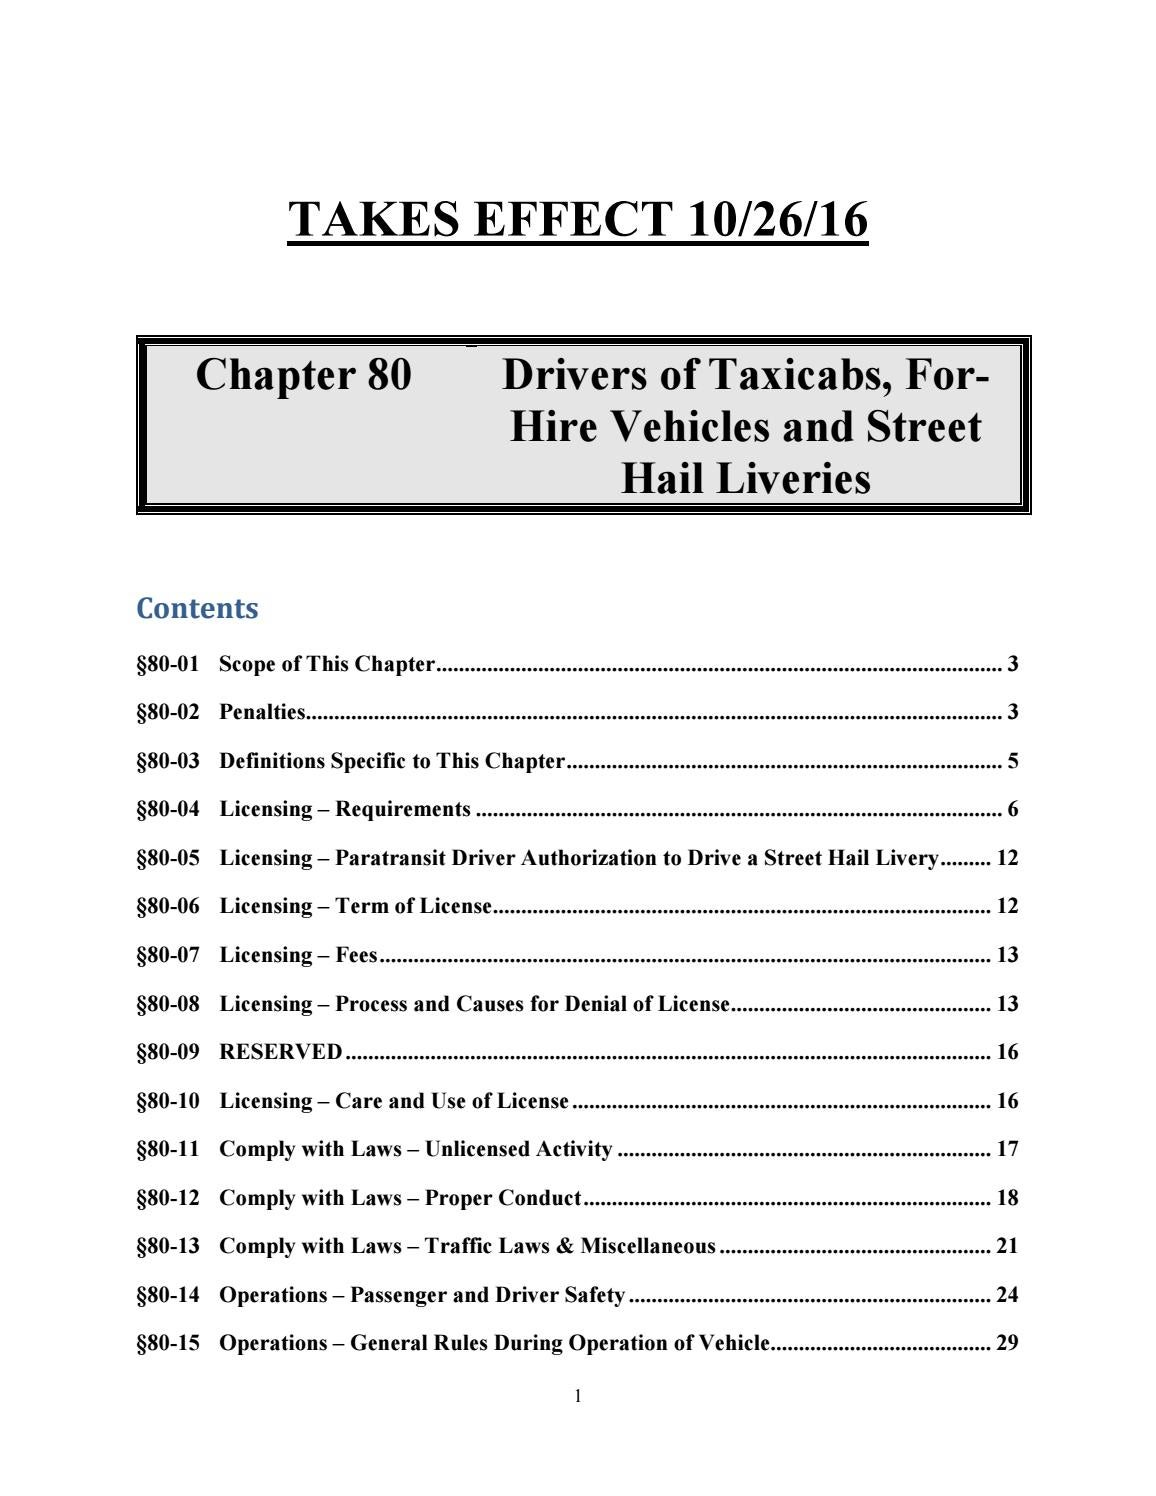 Sample Resume For Paratransit Driver Driver Resume Example Careride  Paratransit Merrick